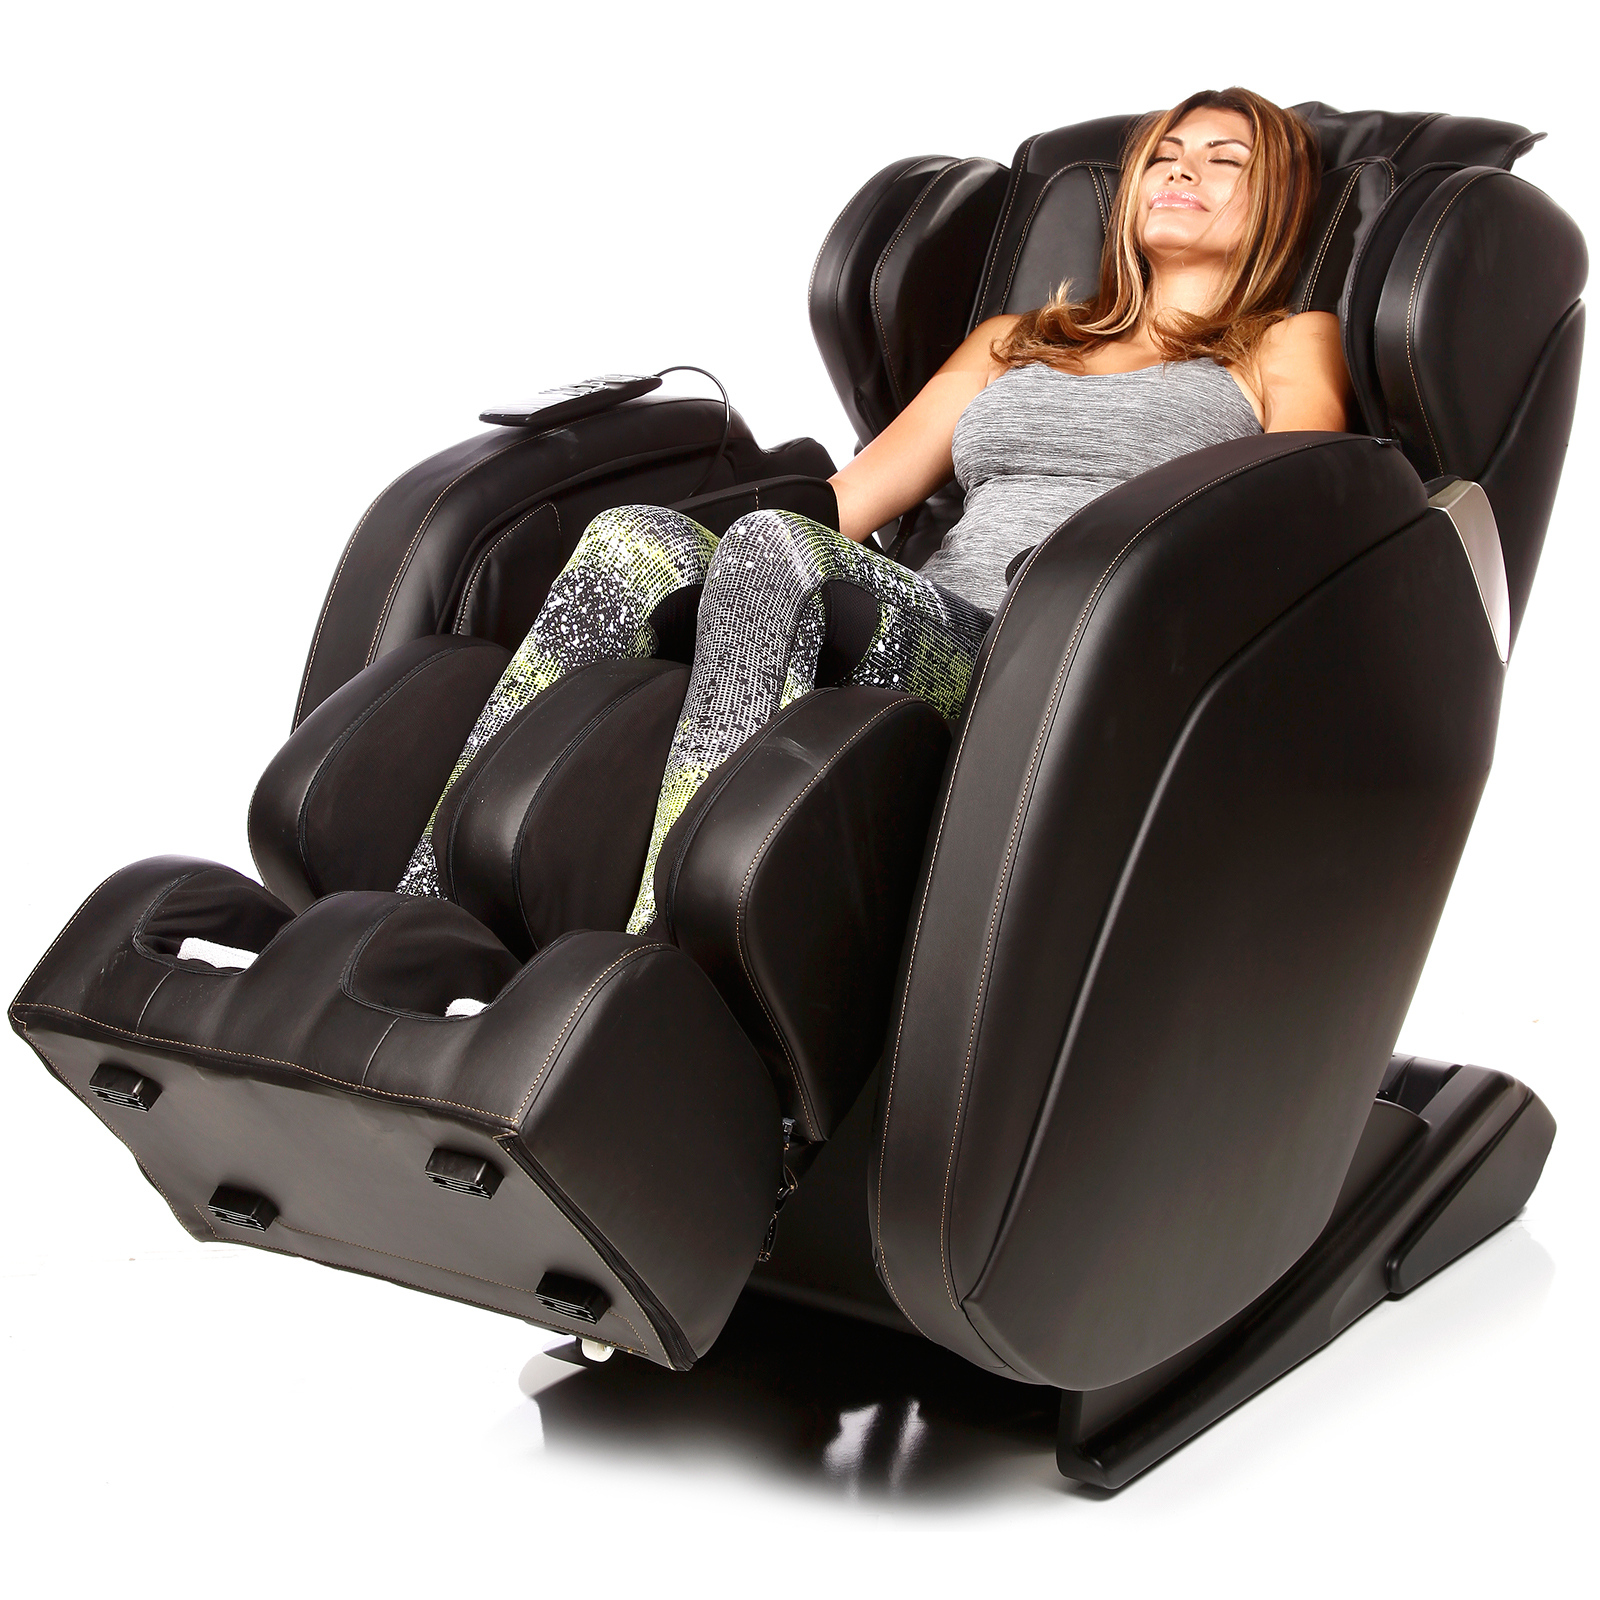 massage chairs fj-5500 dr. fjuji massage chair EFXVYSE